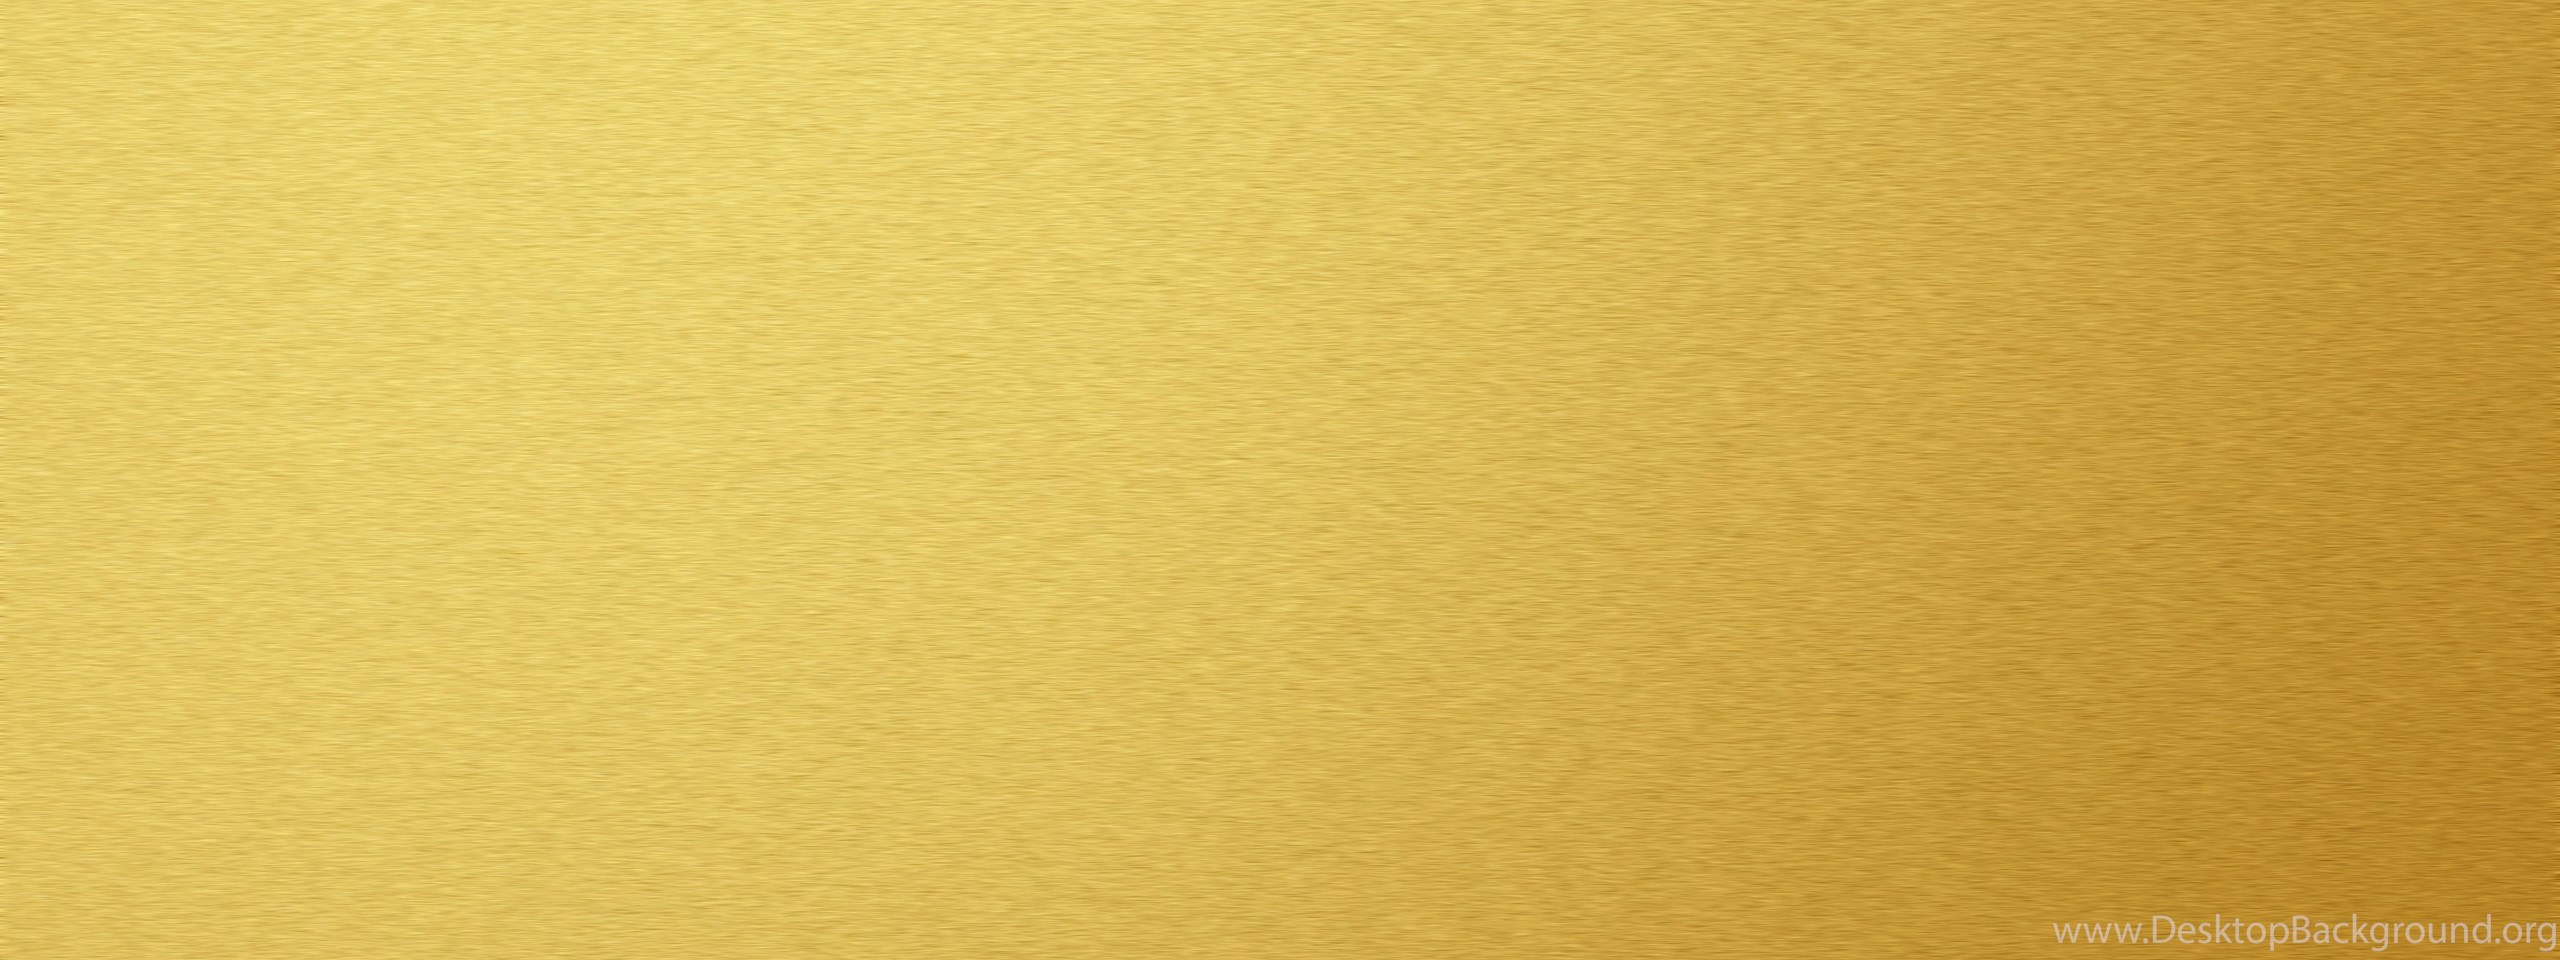 Smooth Gold Foil Texture Wallpaper. Desktop Background